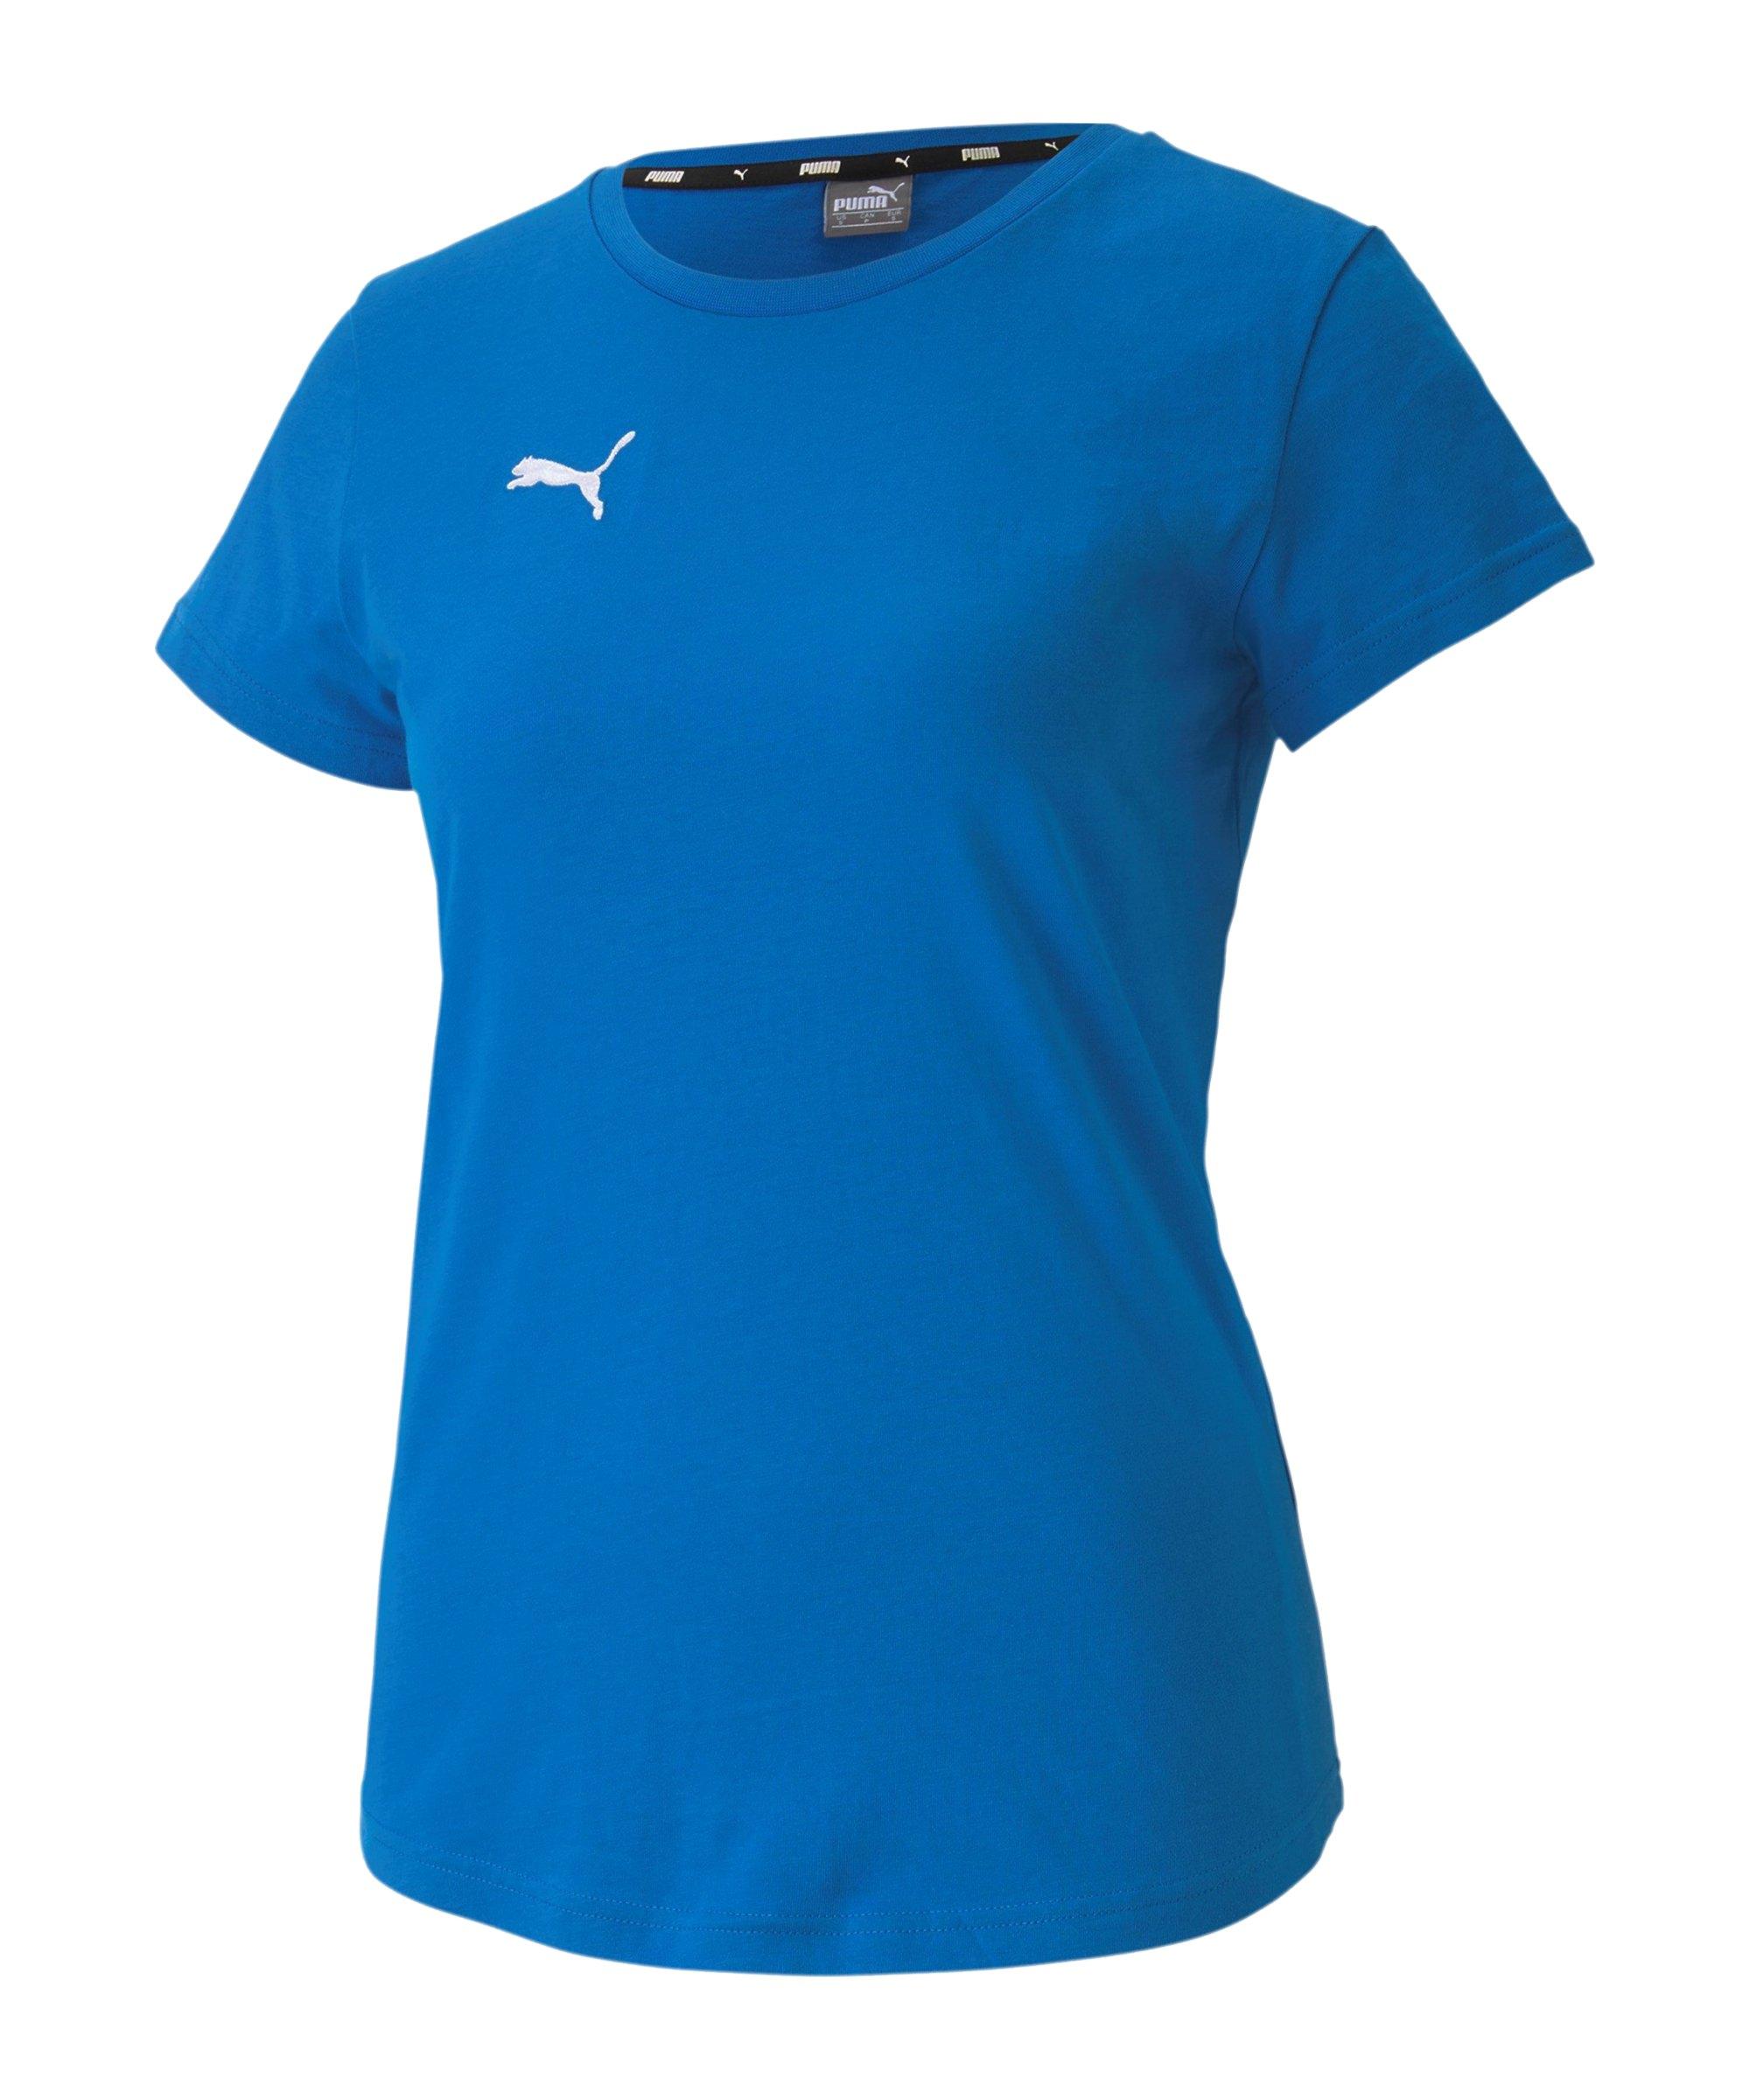 PUMA teamGOAL 23 Casuals T-Shirt Damen Blau F02 - blau